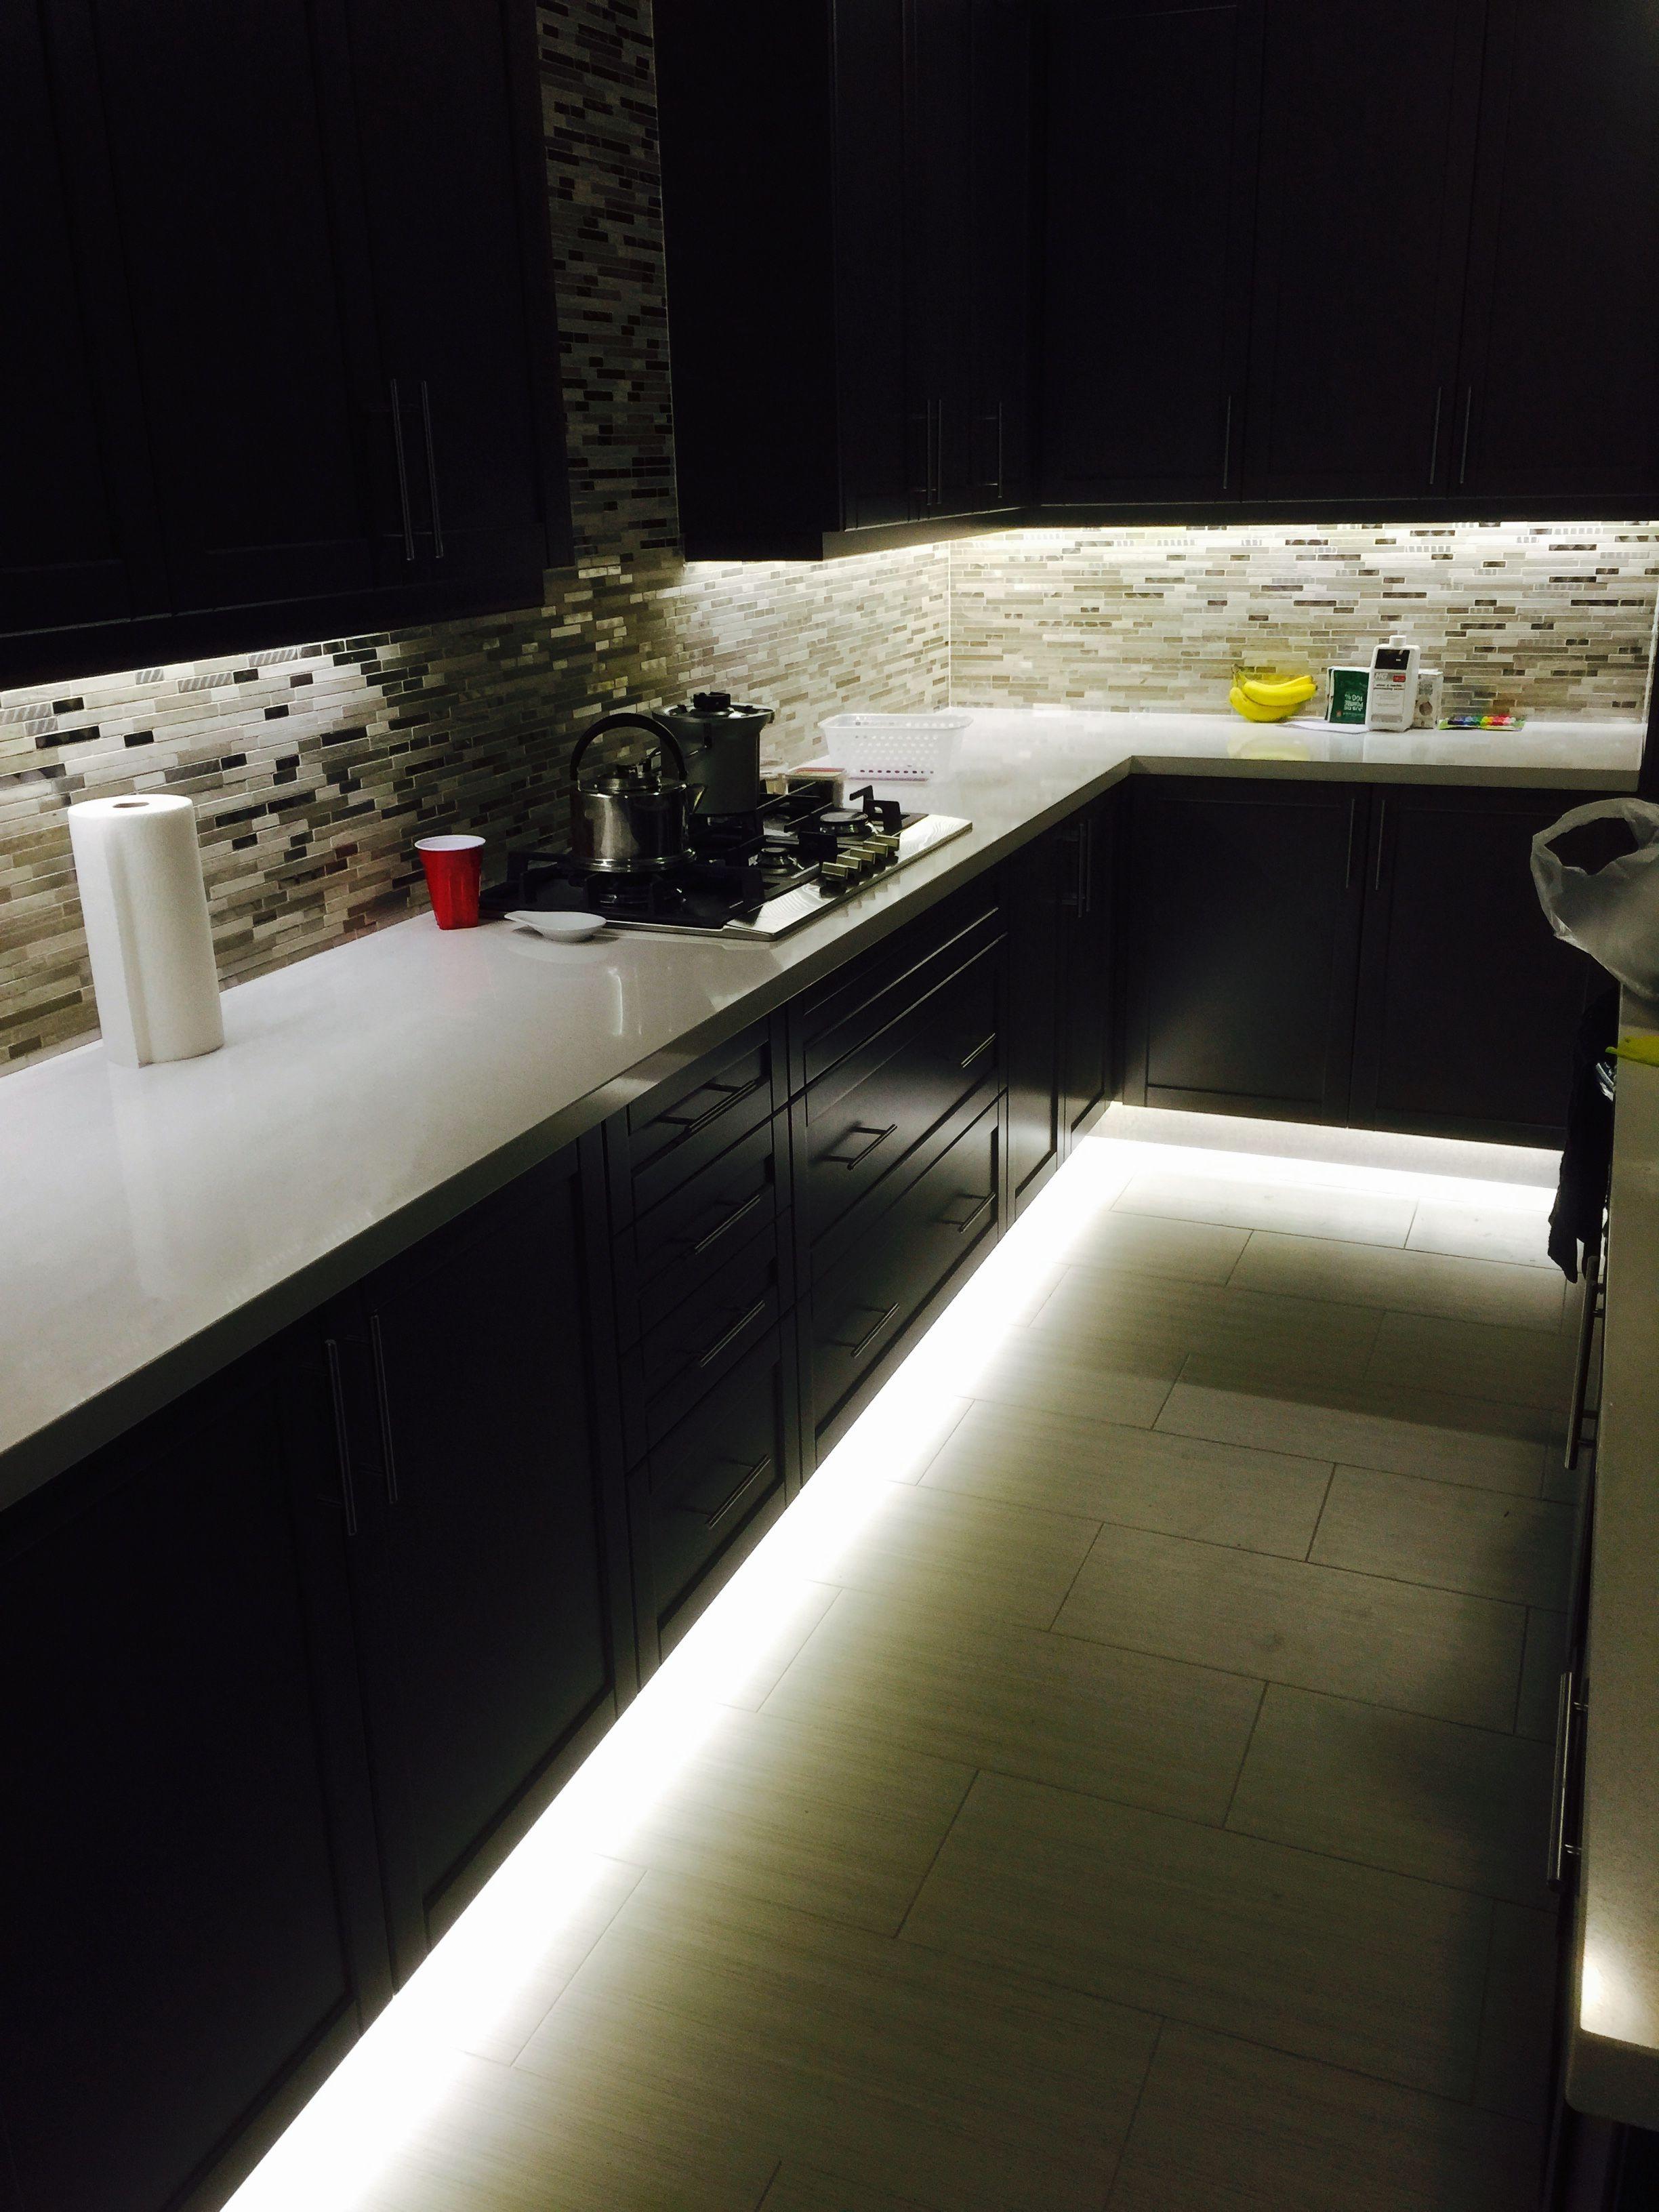 under shelf lighting ideas on 98 led strip lighting applications ideas strip lighting led strip lighting led strip 98 led strip lighting applications